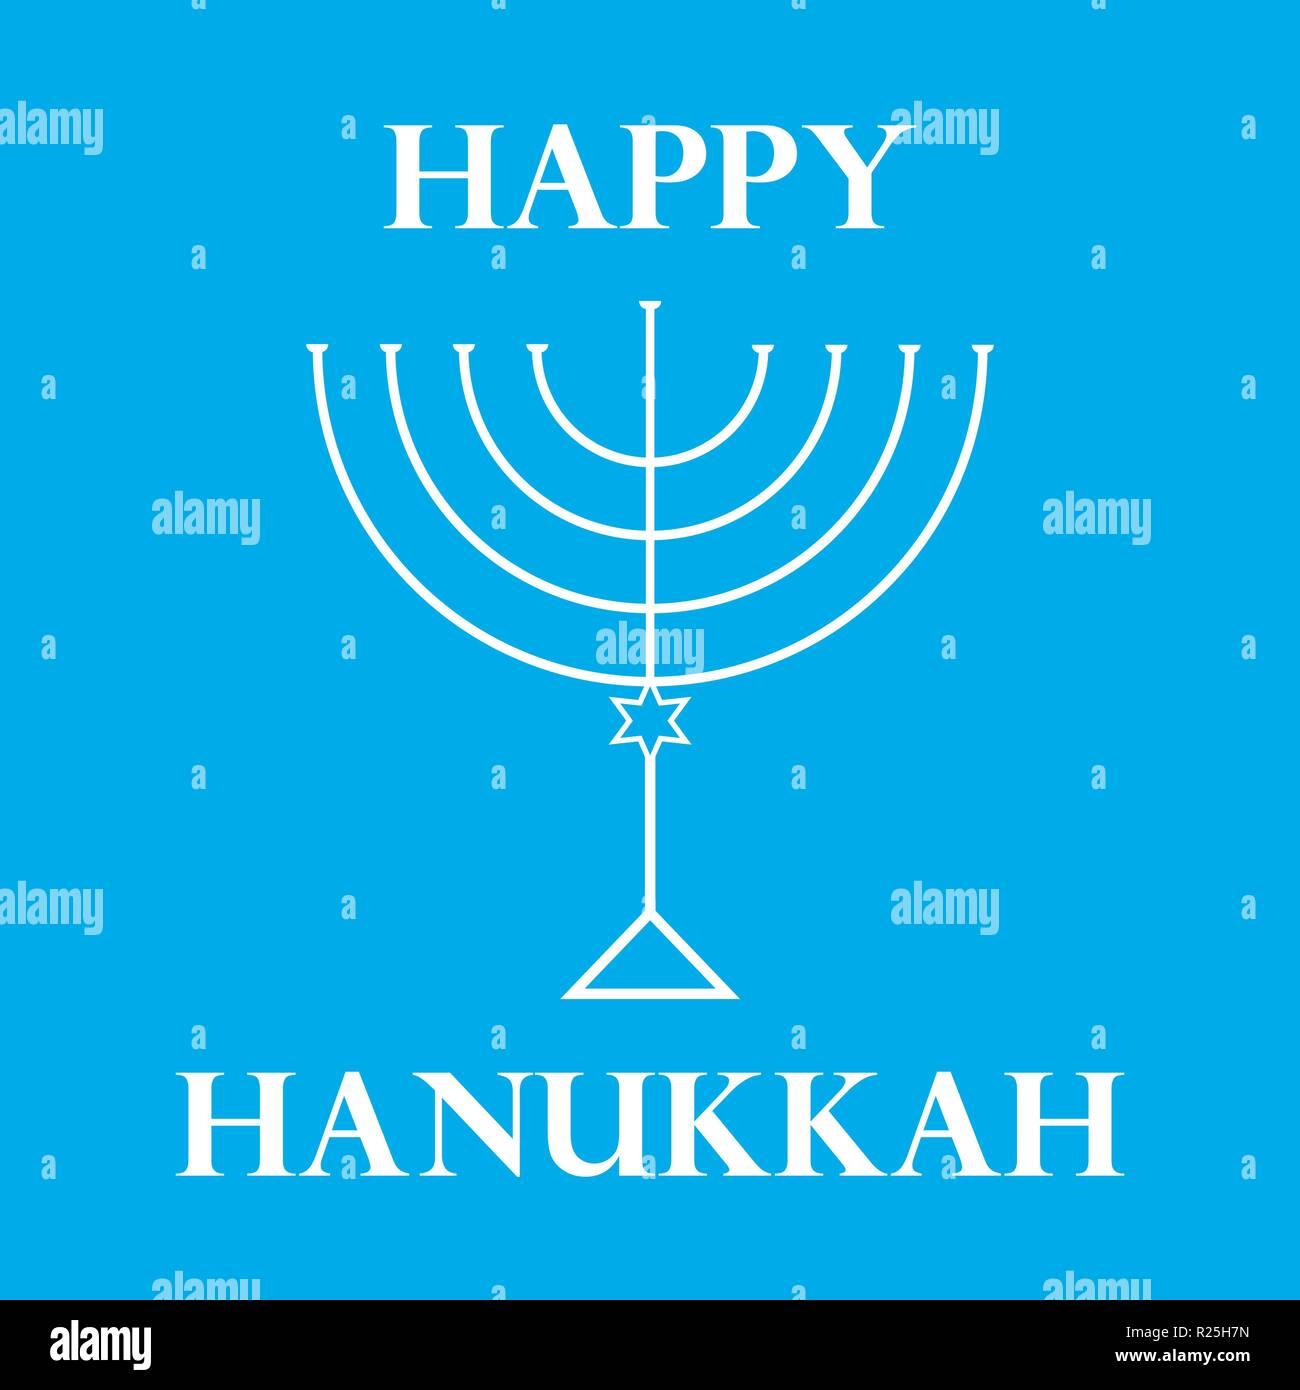 Hanukkah Menorah on Light Blue Background a Stock Vector